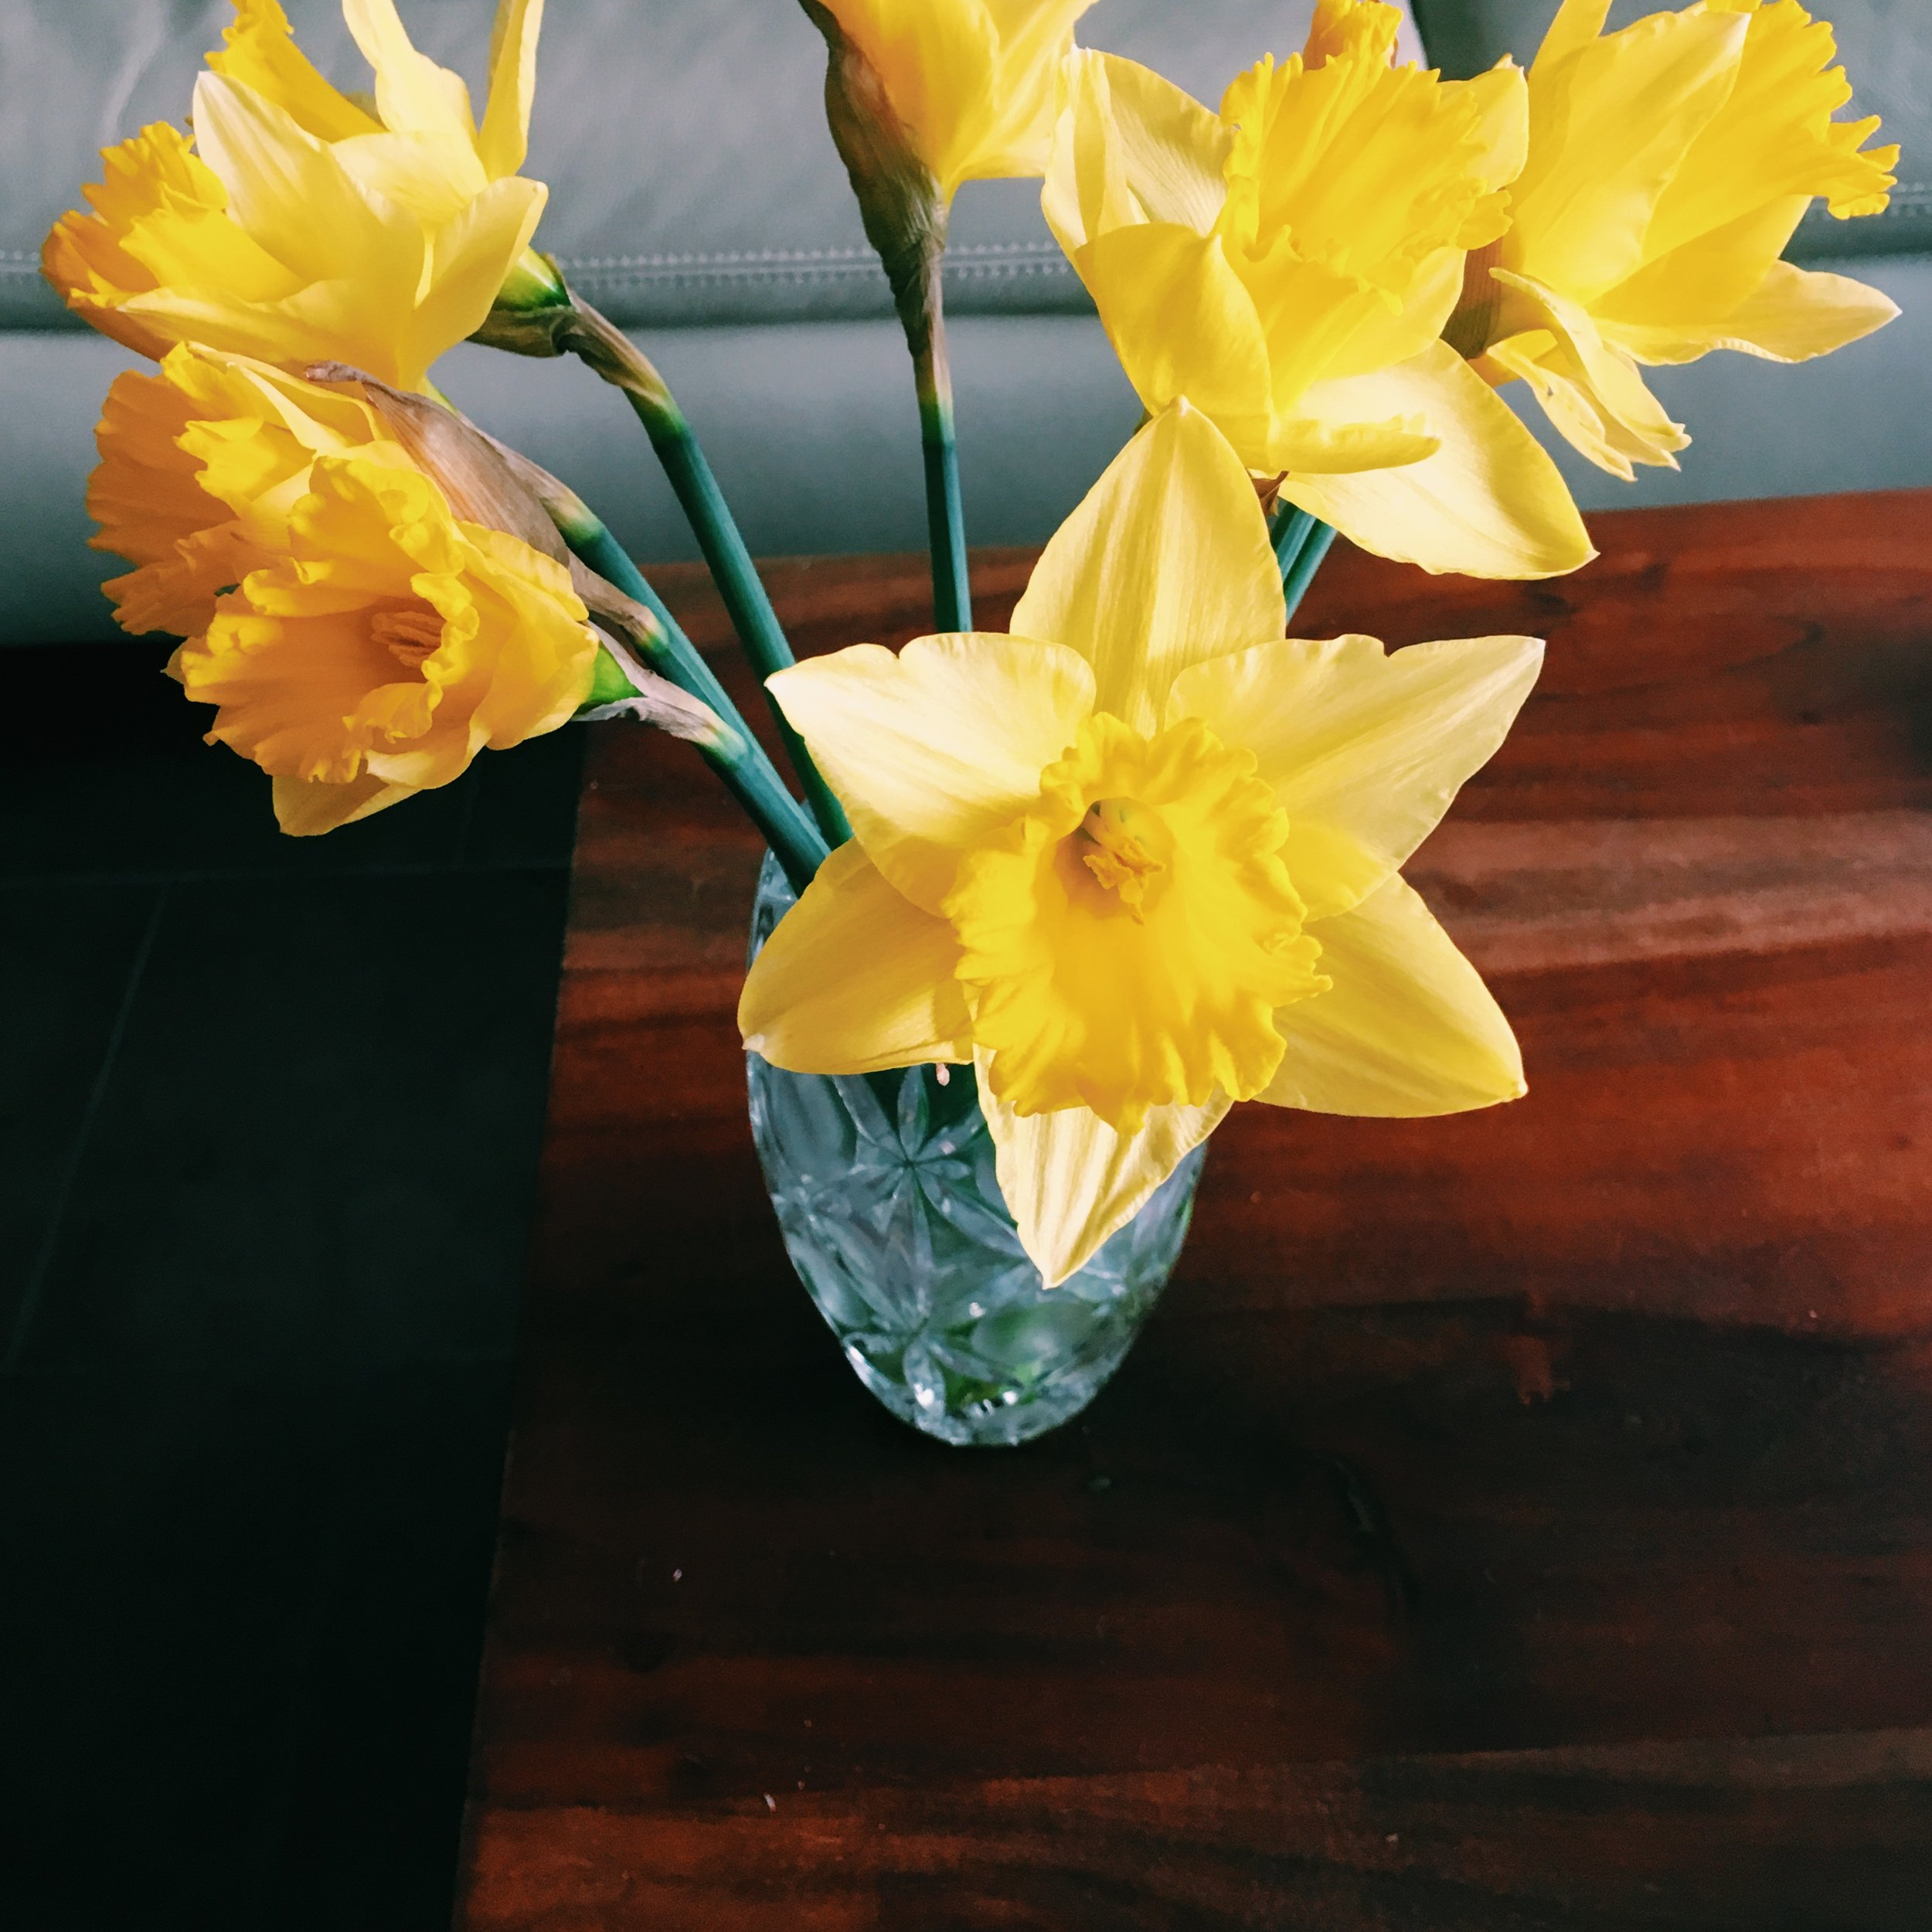 8.Narcissus - スイセン